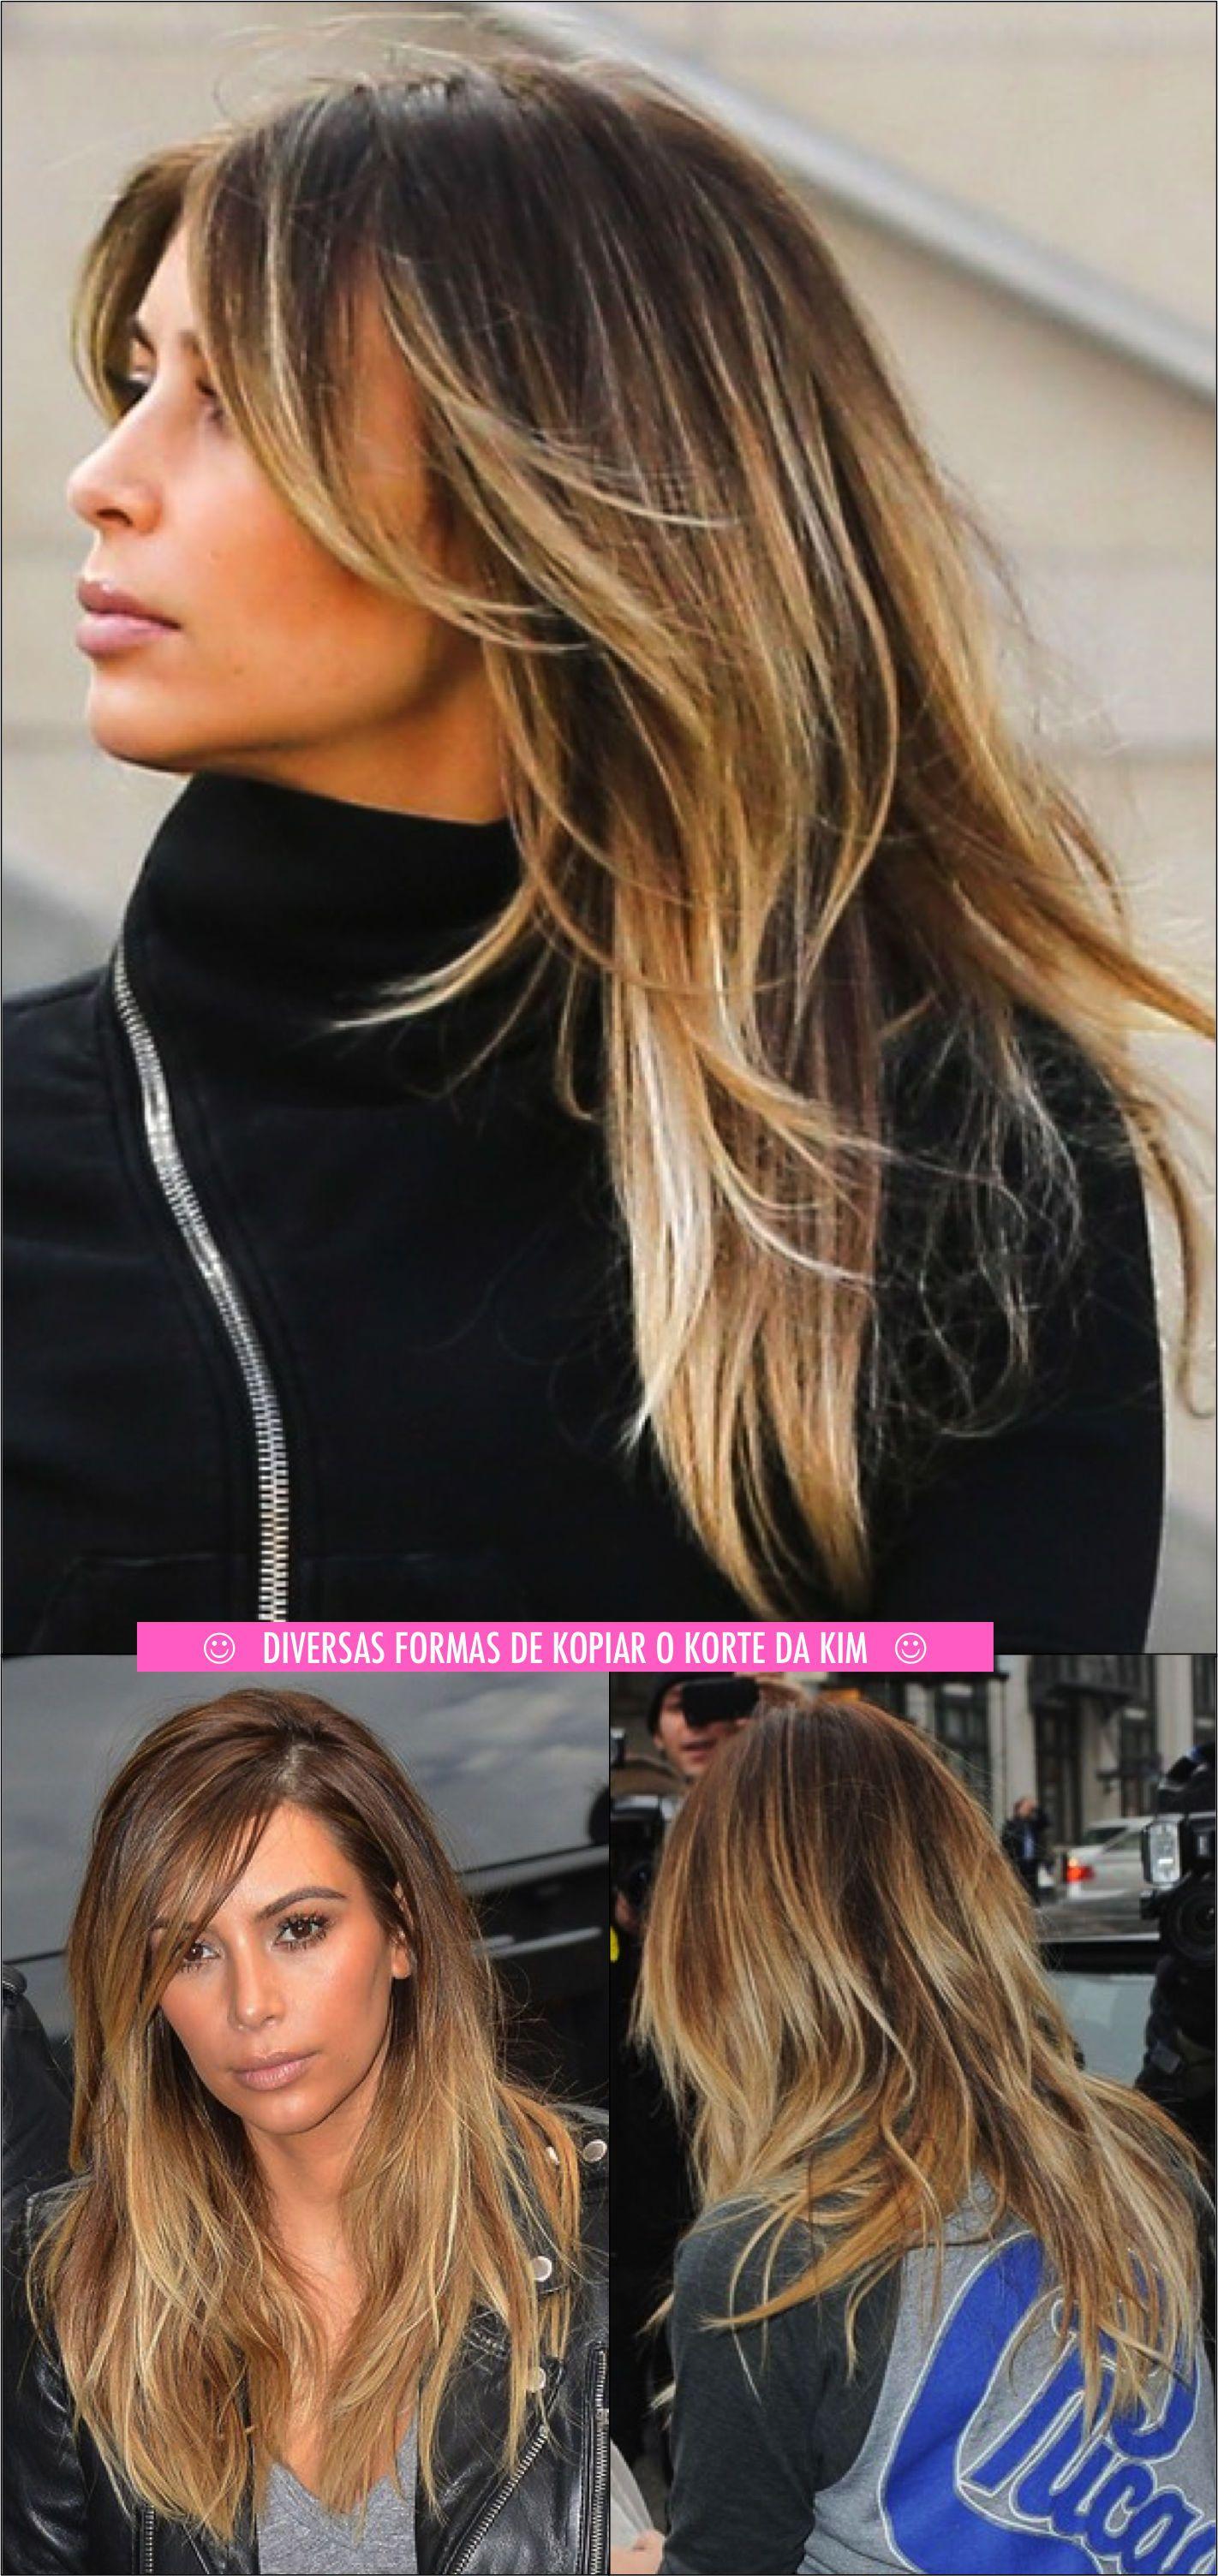 Cortecabelokim cabelinhus pinterest kardashian brunettes